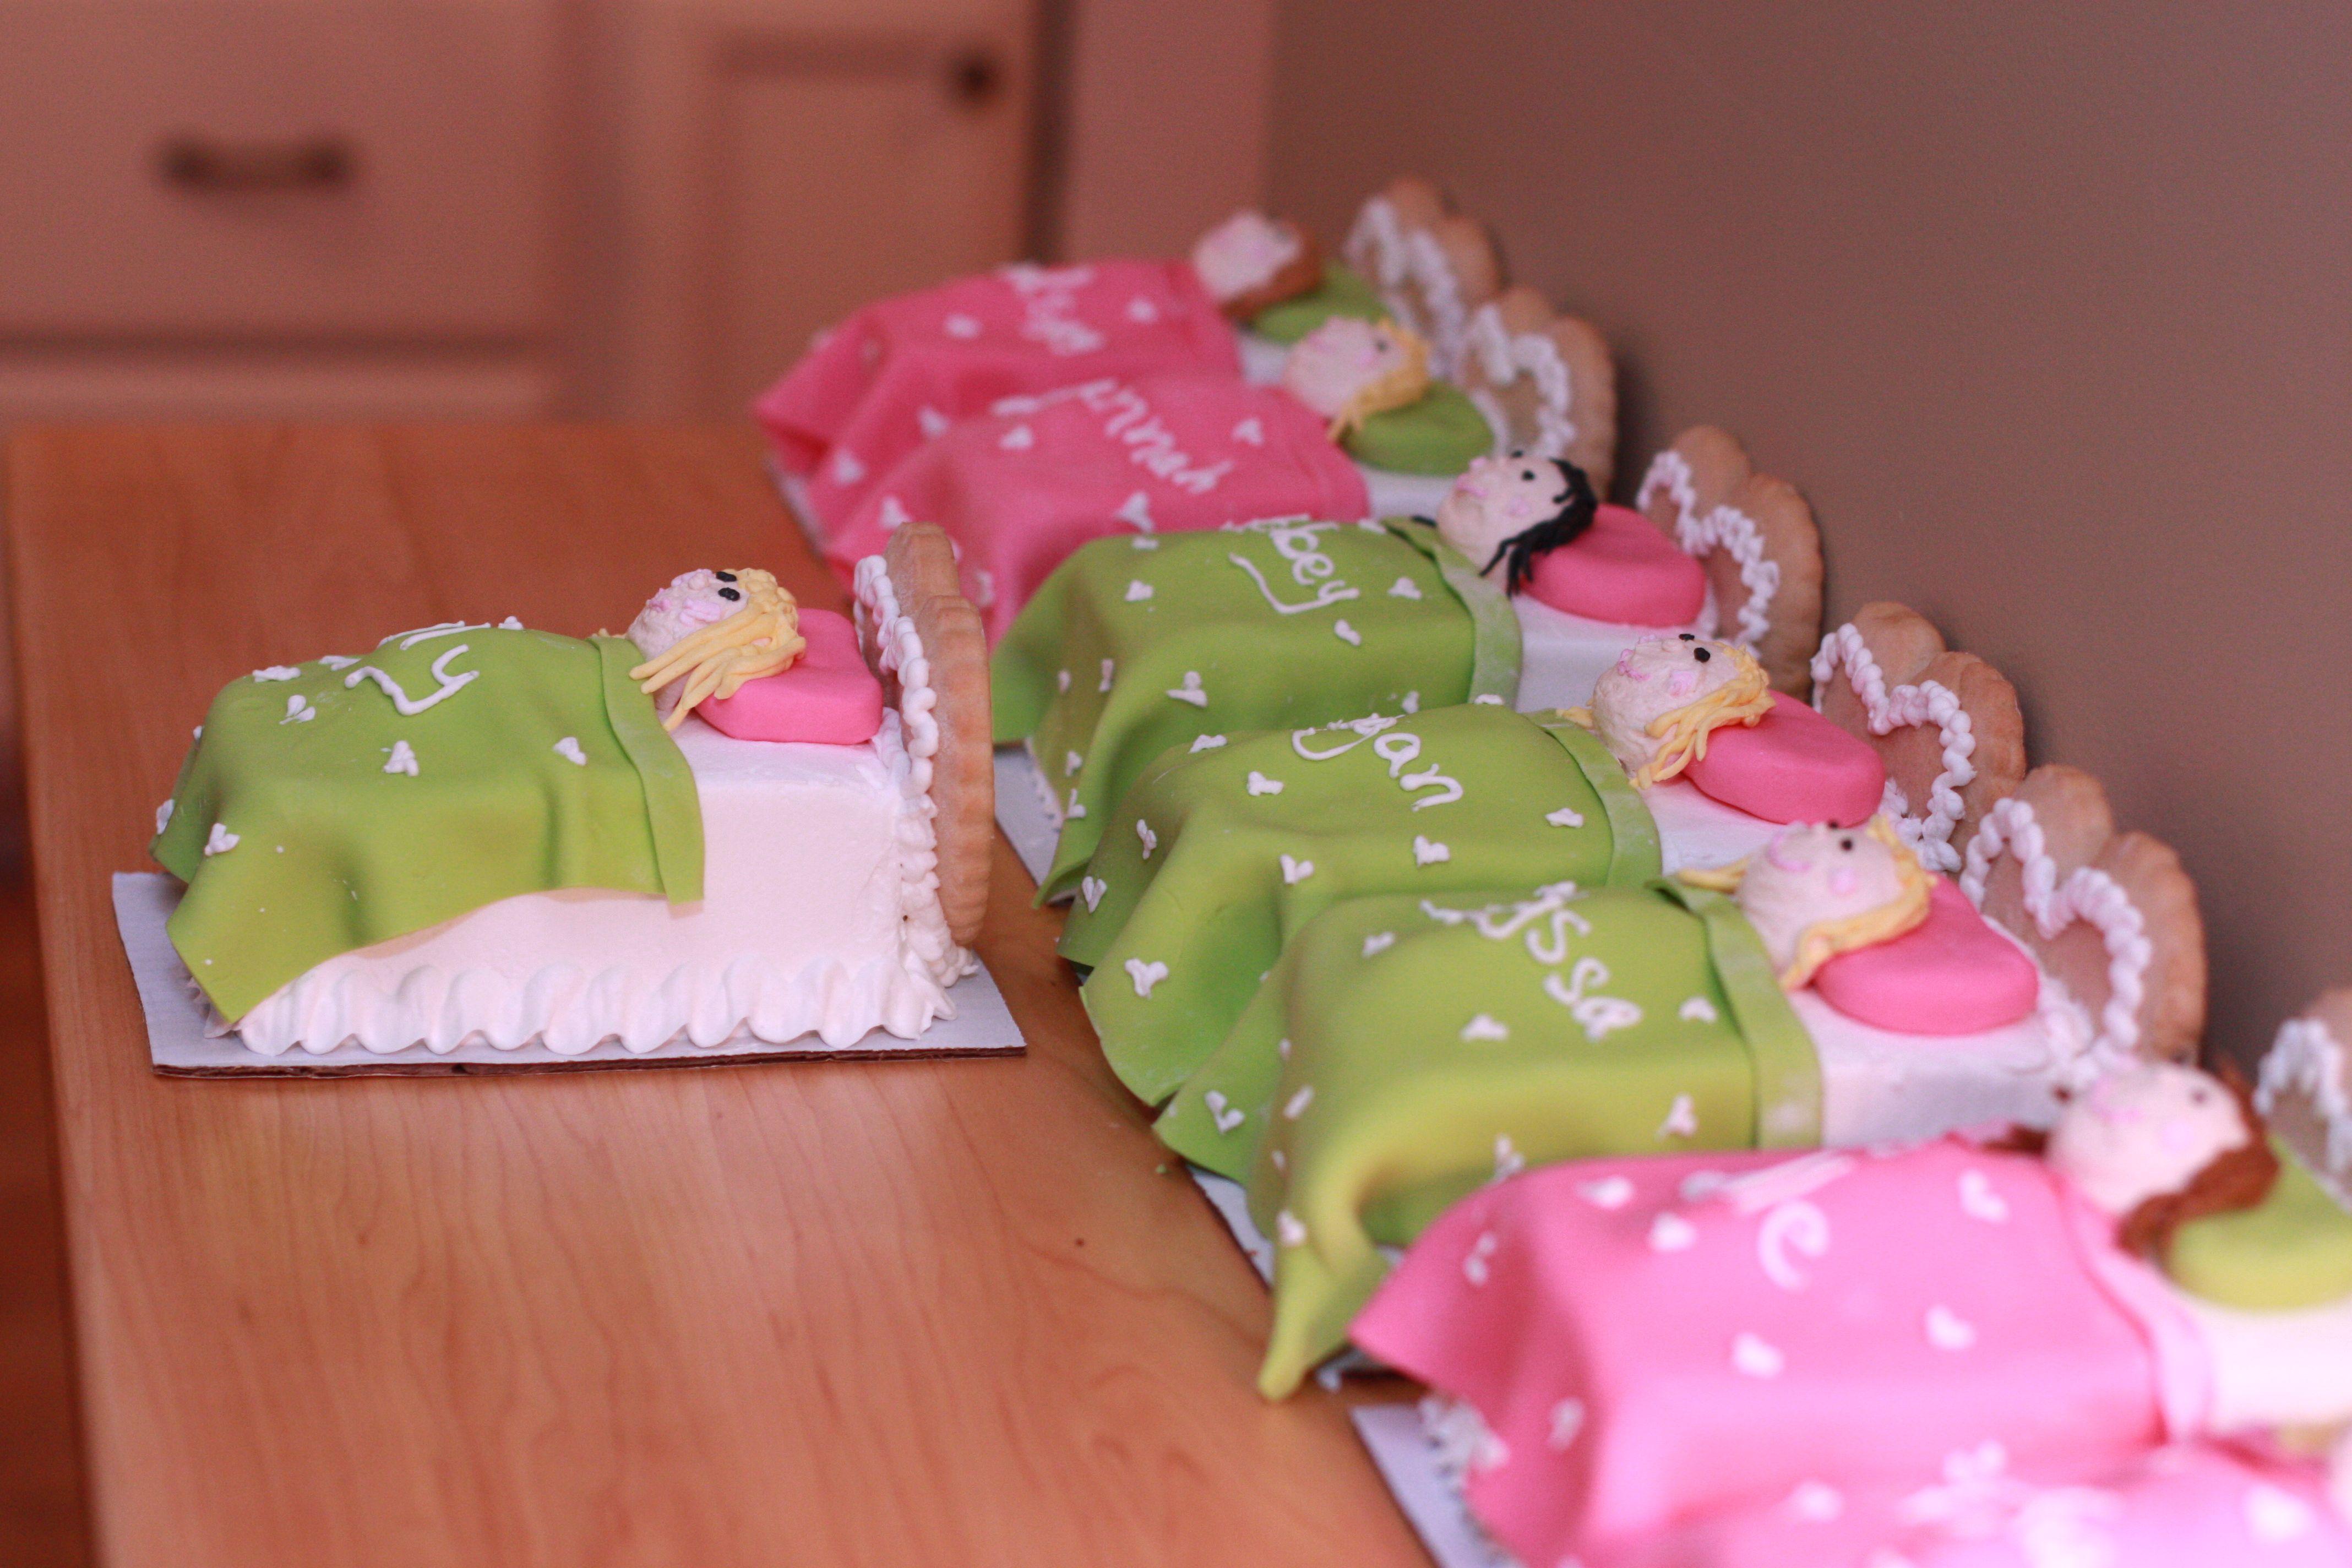 Slumber party cakes one for each girl bday ideas Pinterest